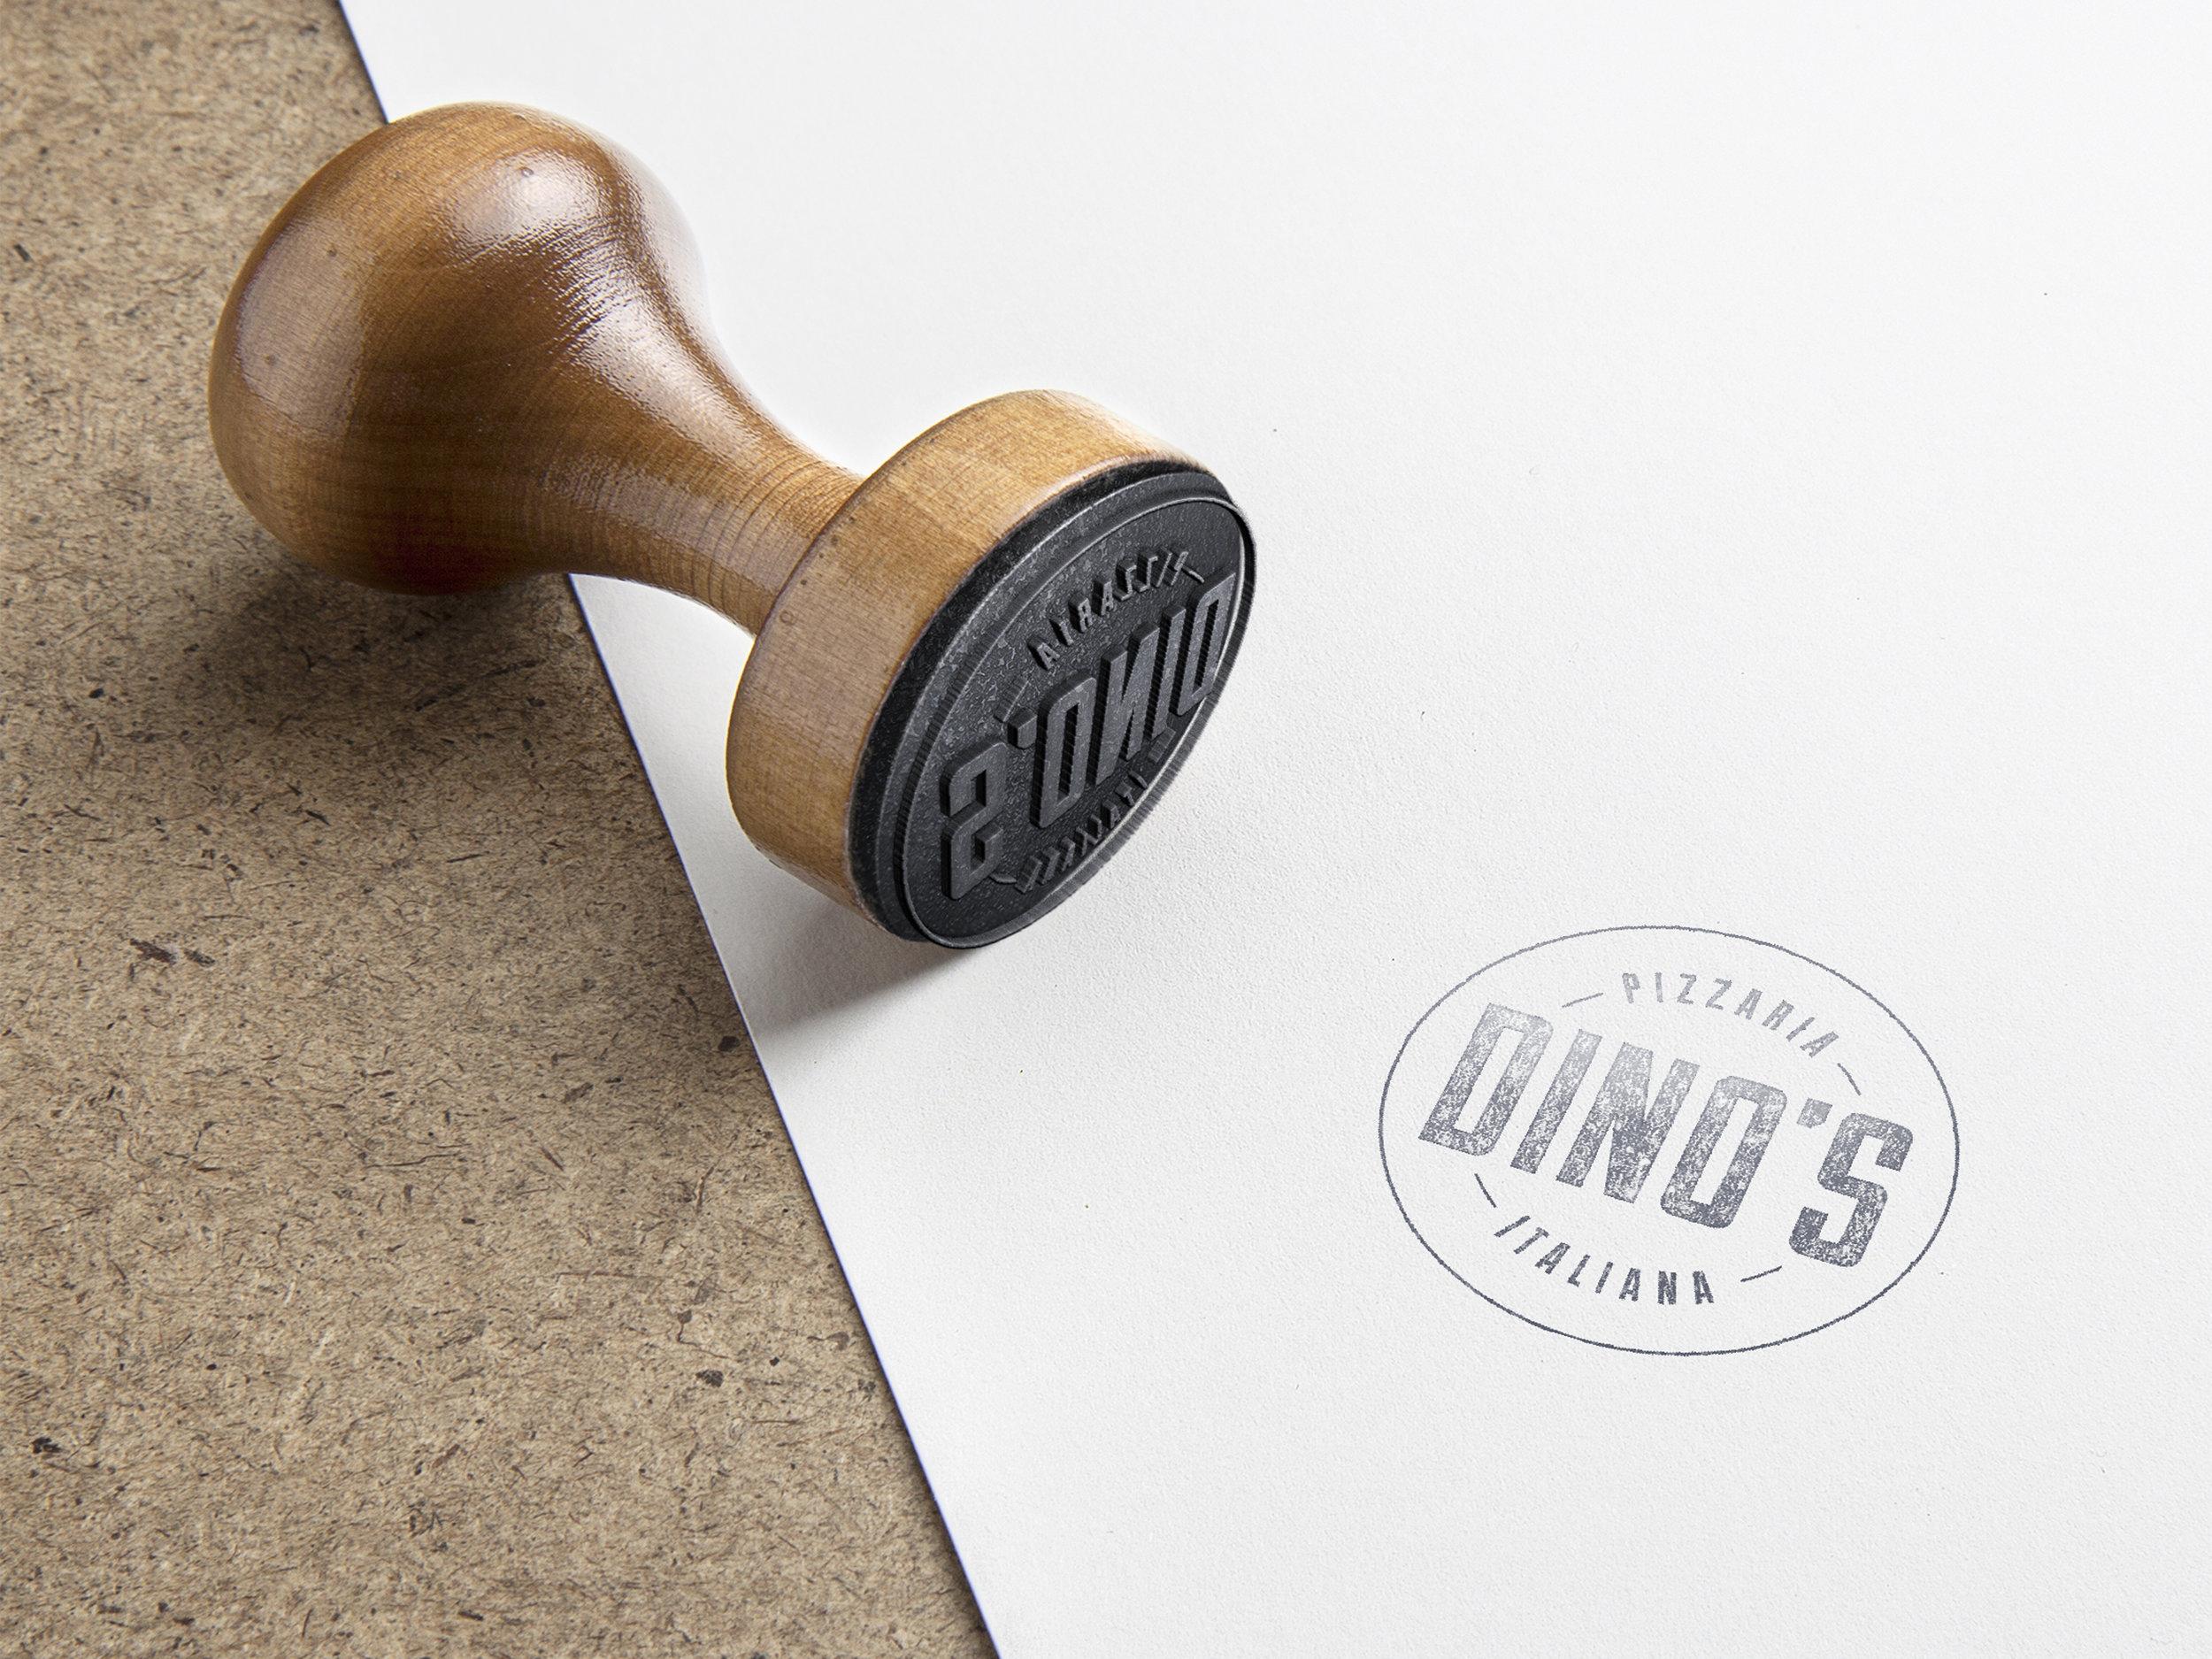 Dino's_stamp.JPG